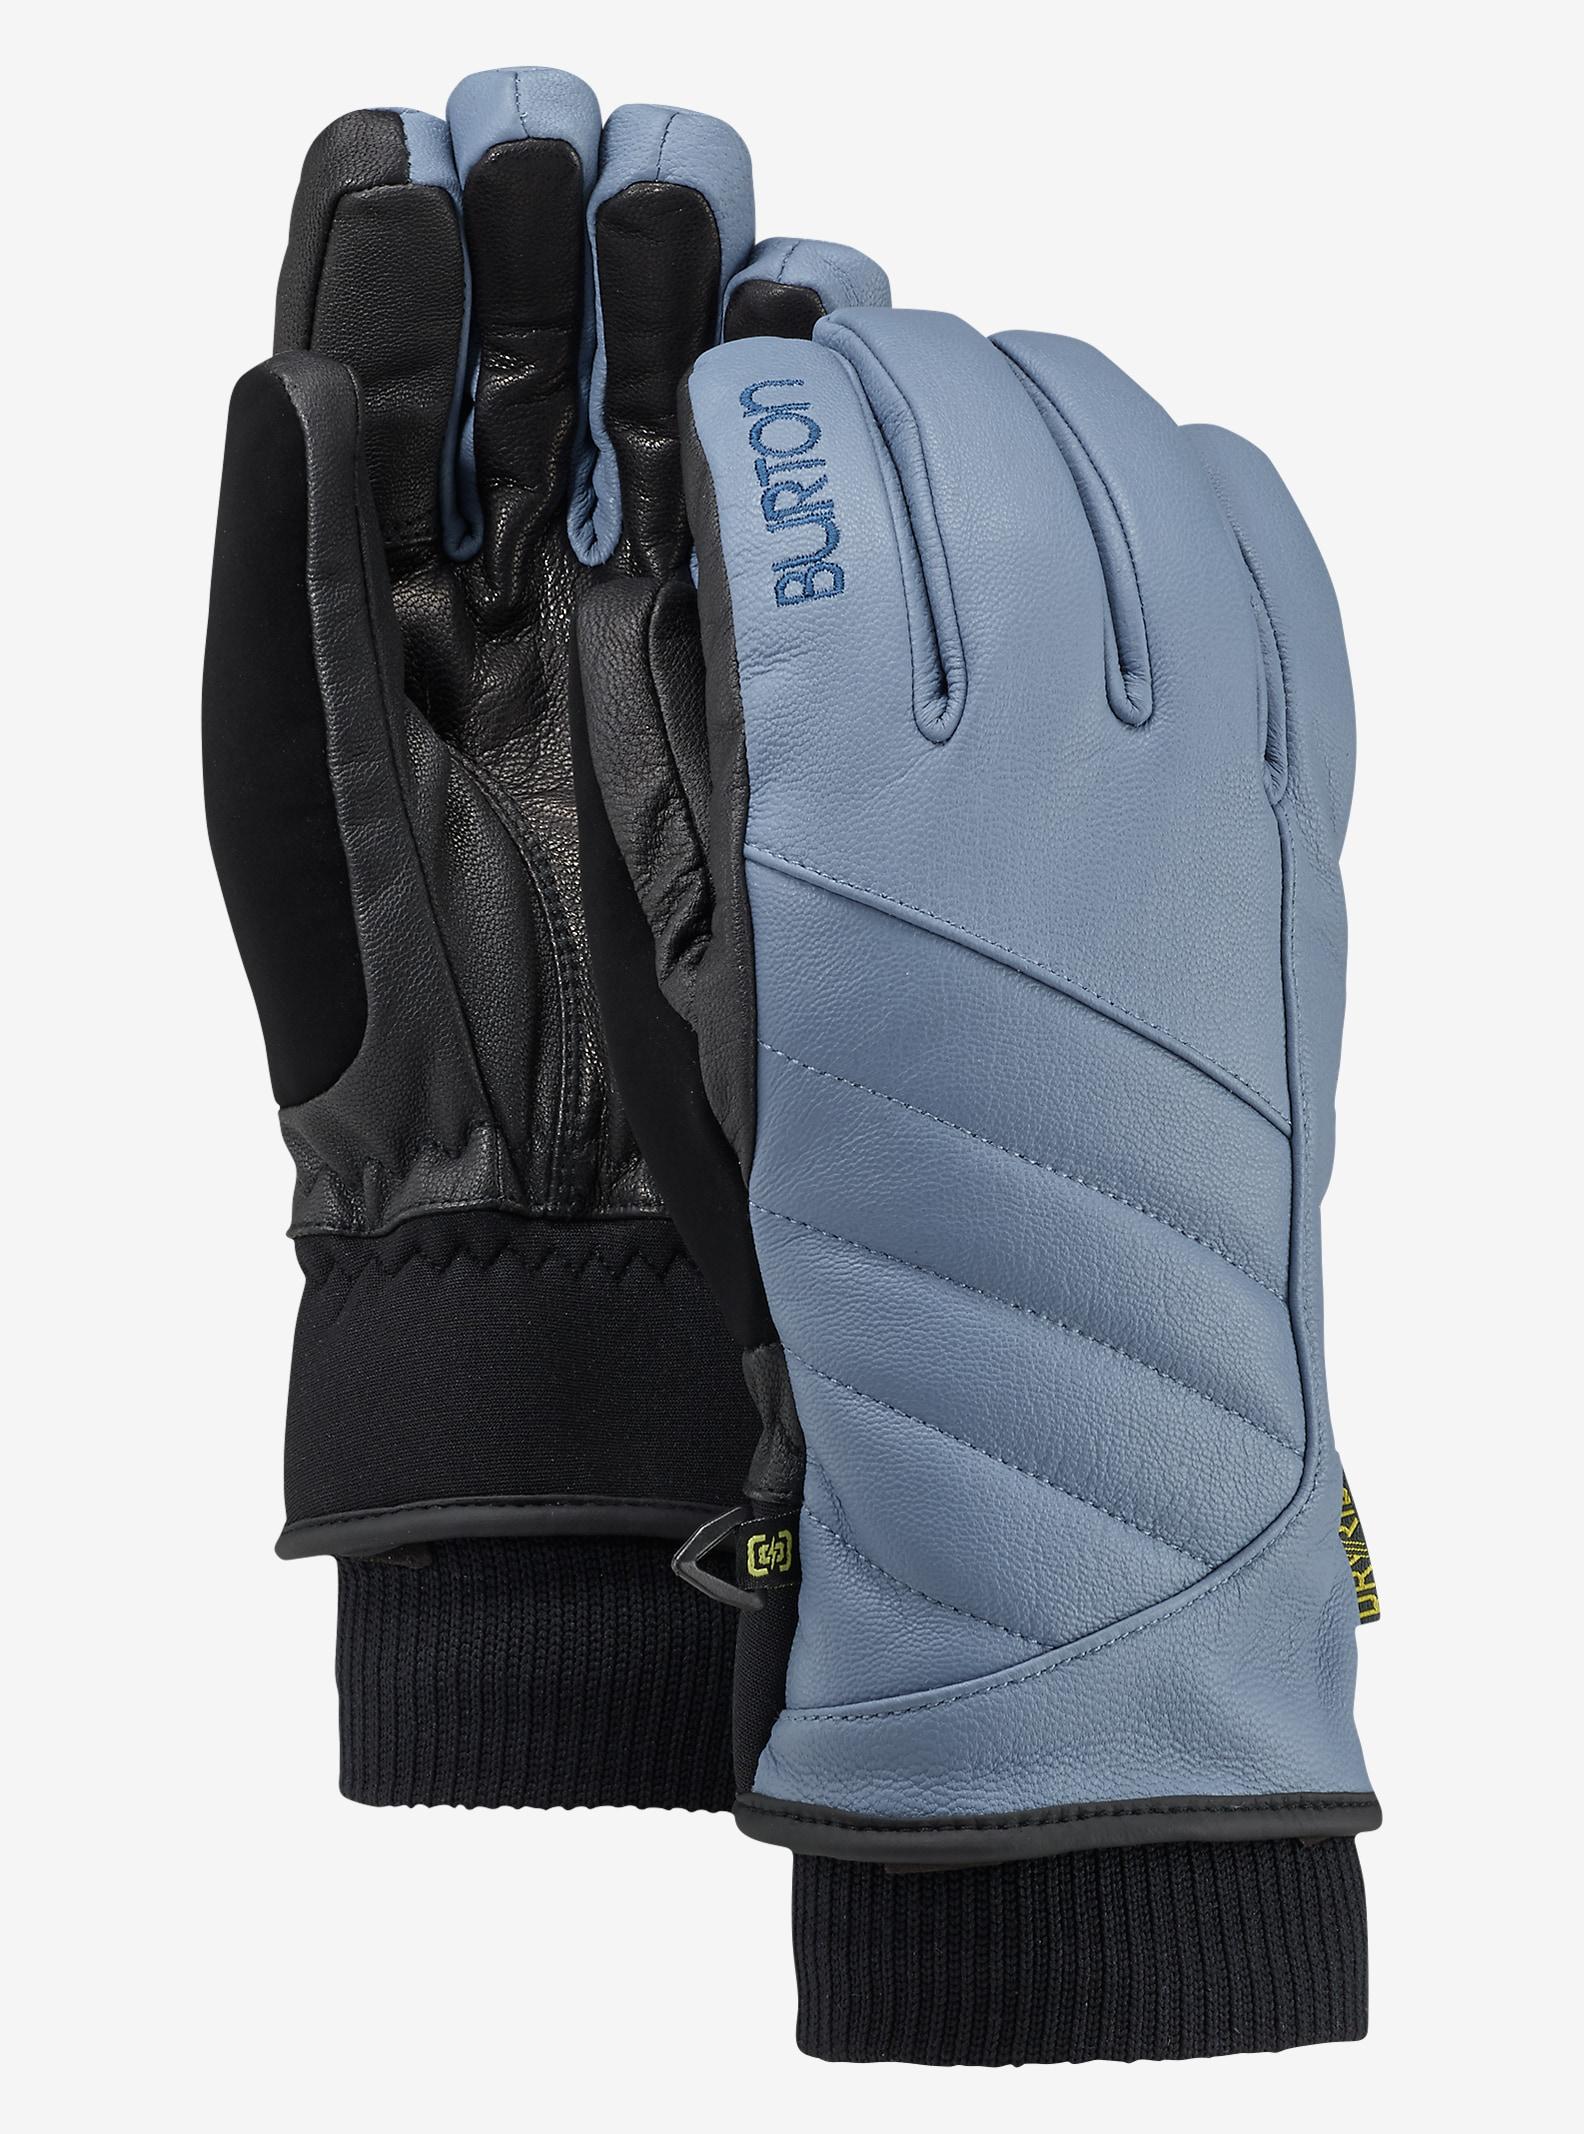 Burton Favorite Leather Glove shown in Infinity